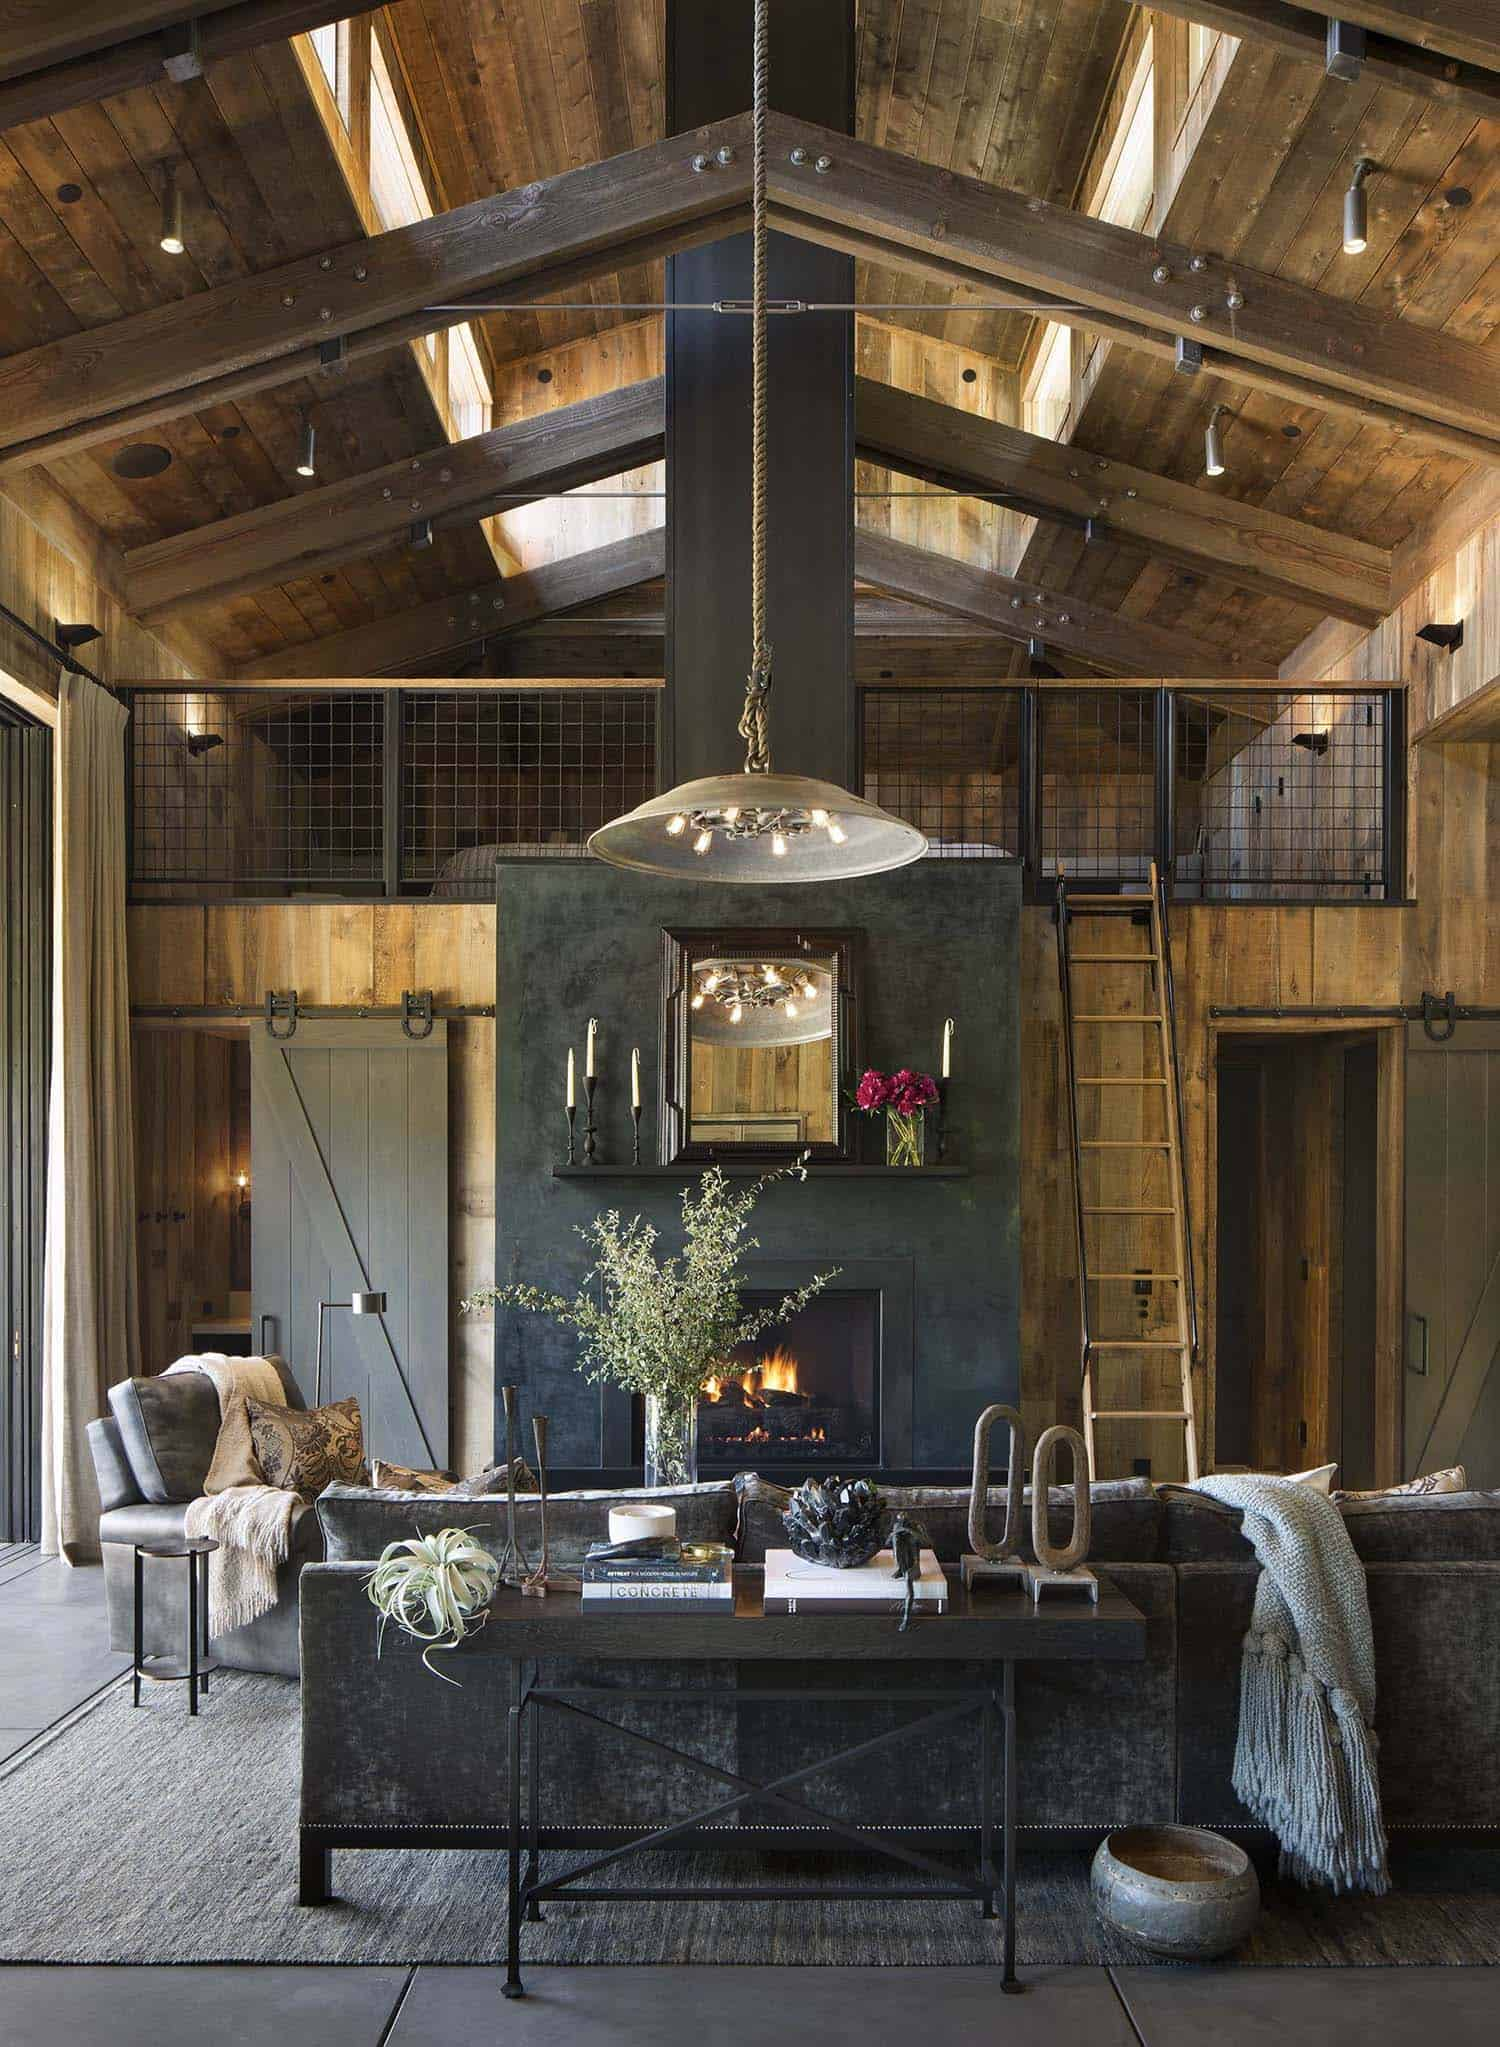 Maison de style ferme-Jennifer Robin Interiors-003-1 Kindesign